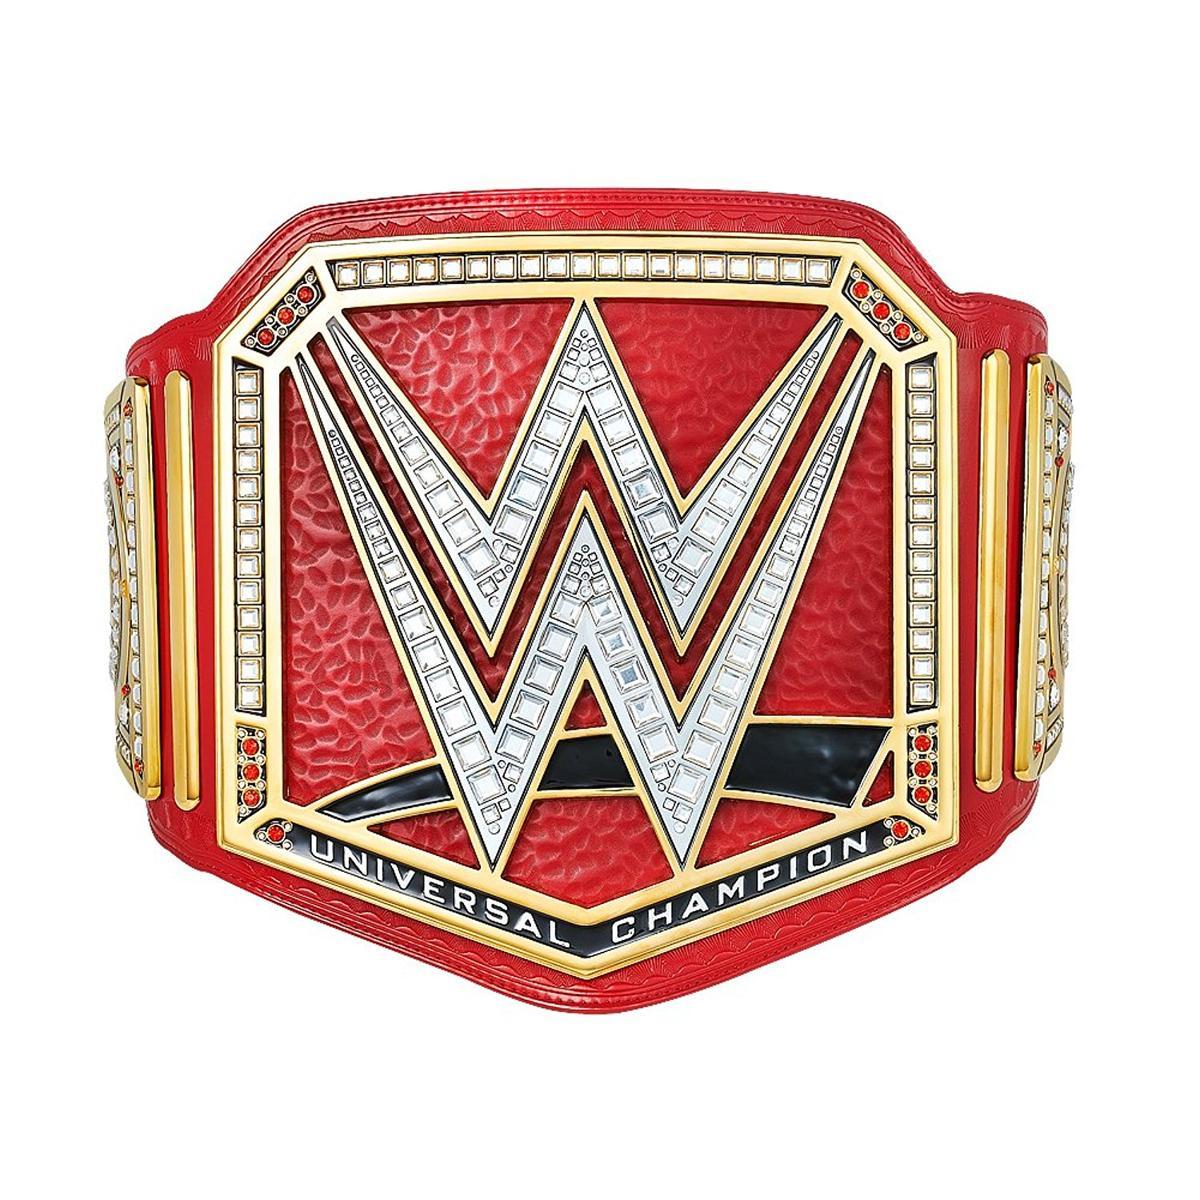 WWE ユニバーサル王座 チャンピオンベルト レプリカ 赤 2014 アメリカ プロレス グッズ